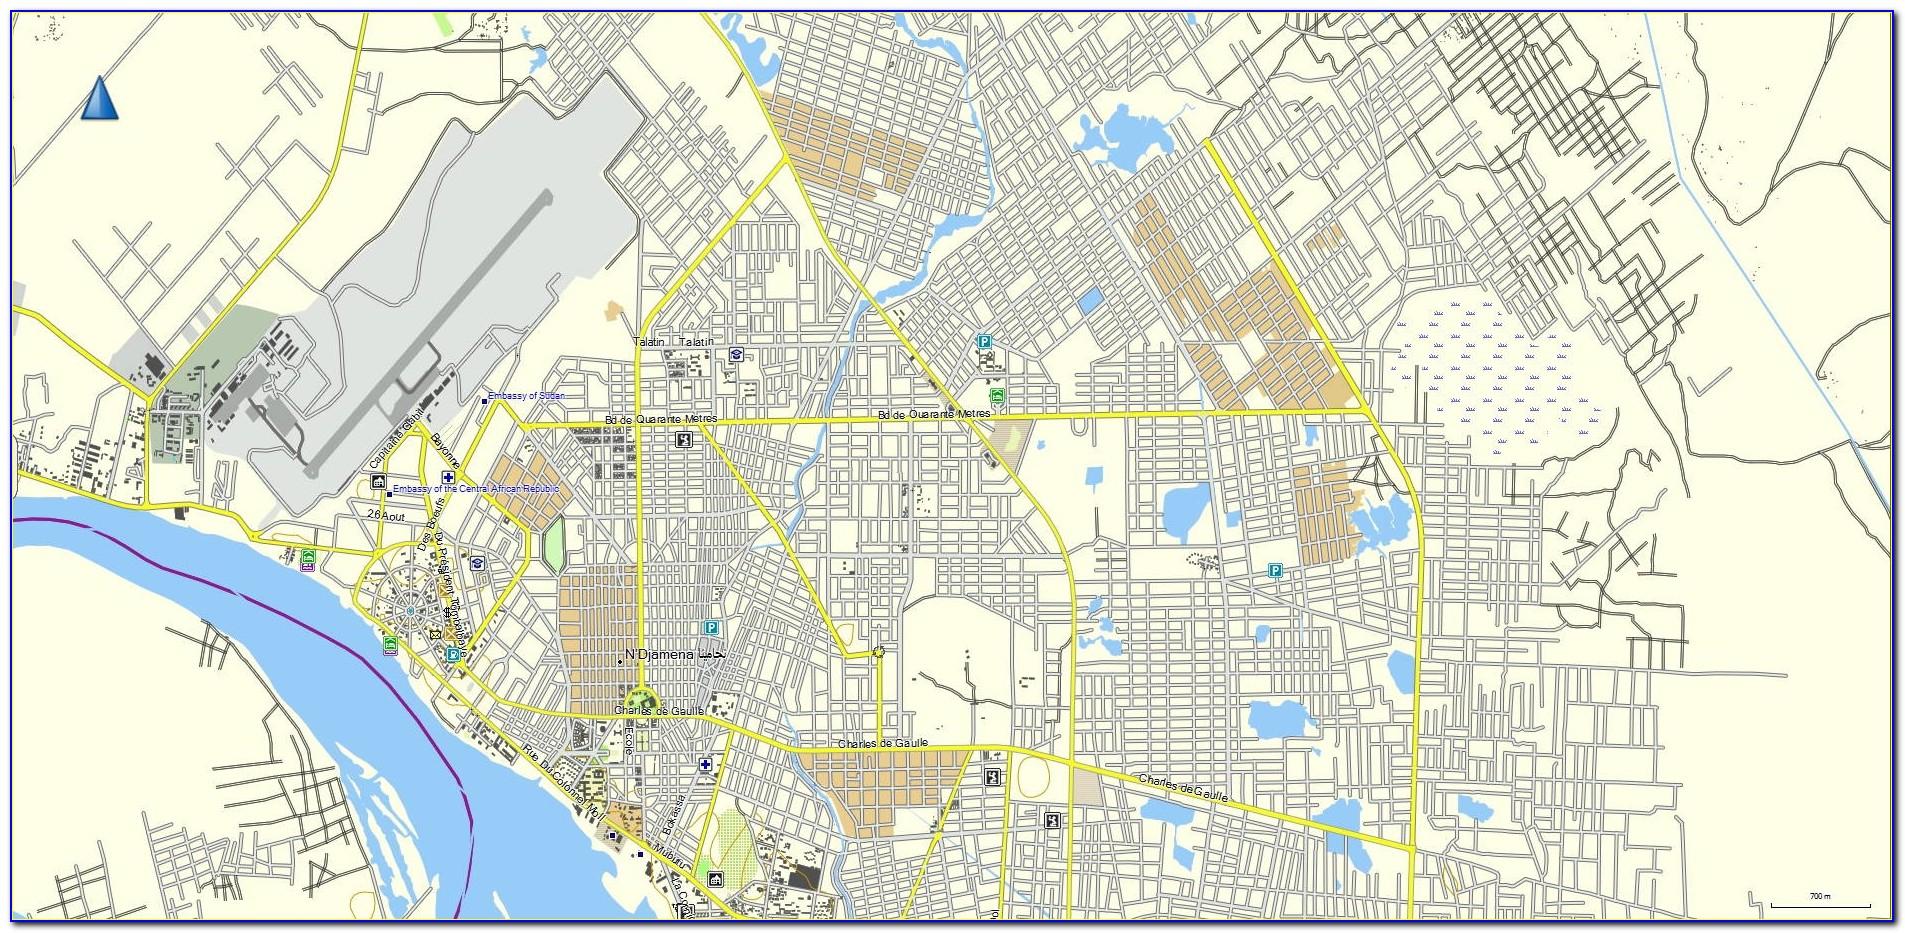 Etrex 20 Maps On Sd Card